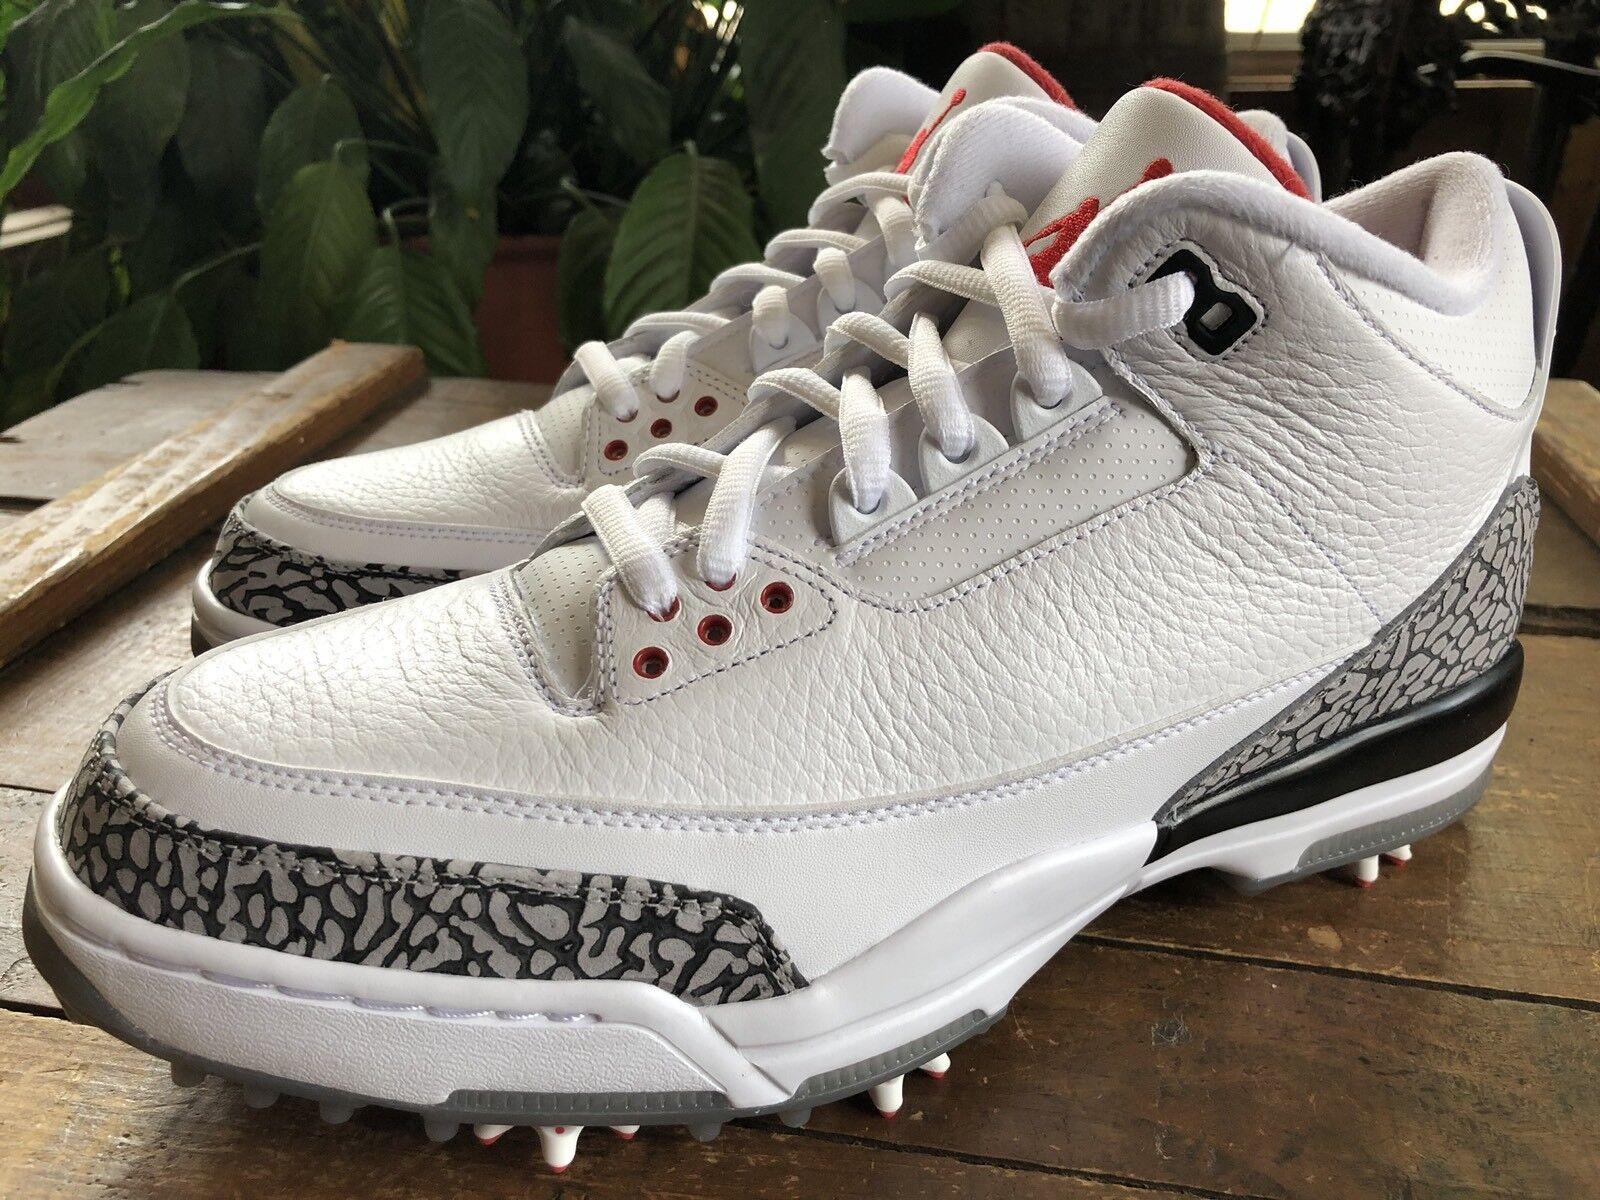 Nuove nike air jordan iii 3 vintage golf scarpette scarpe di cemento